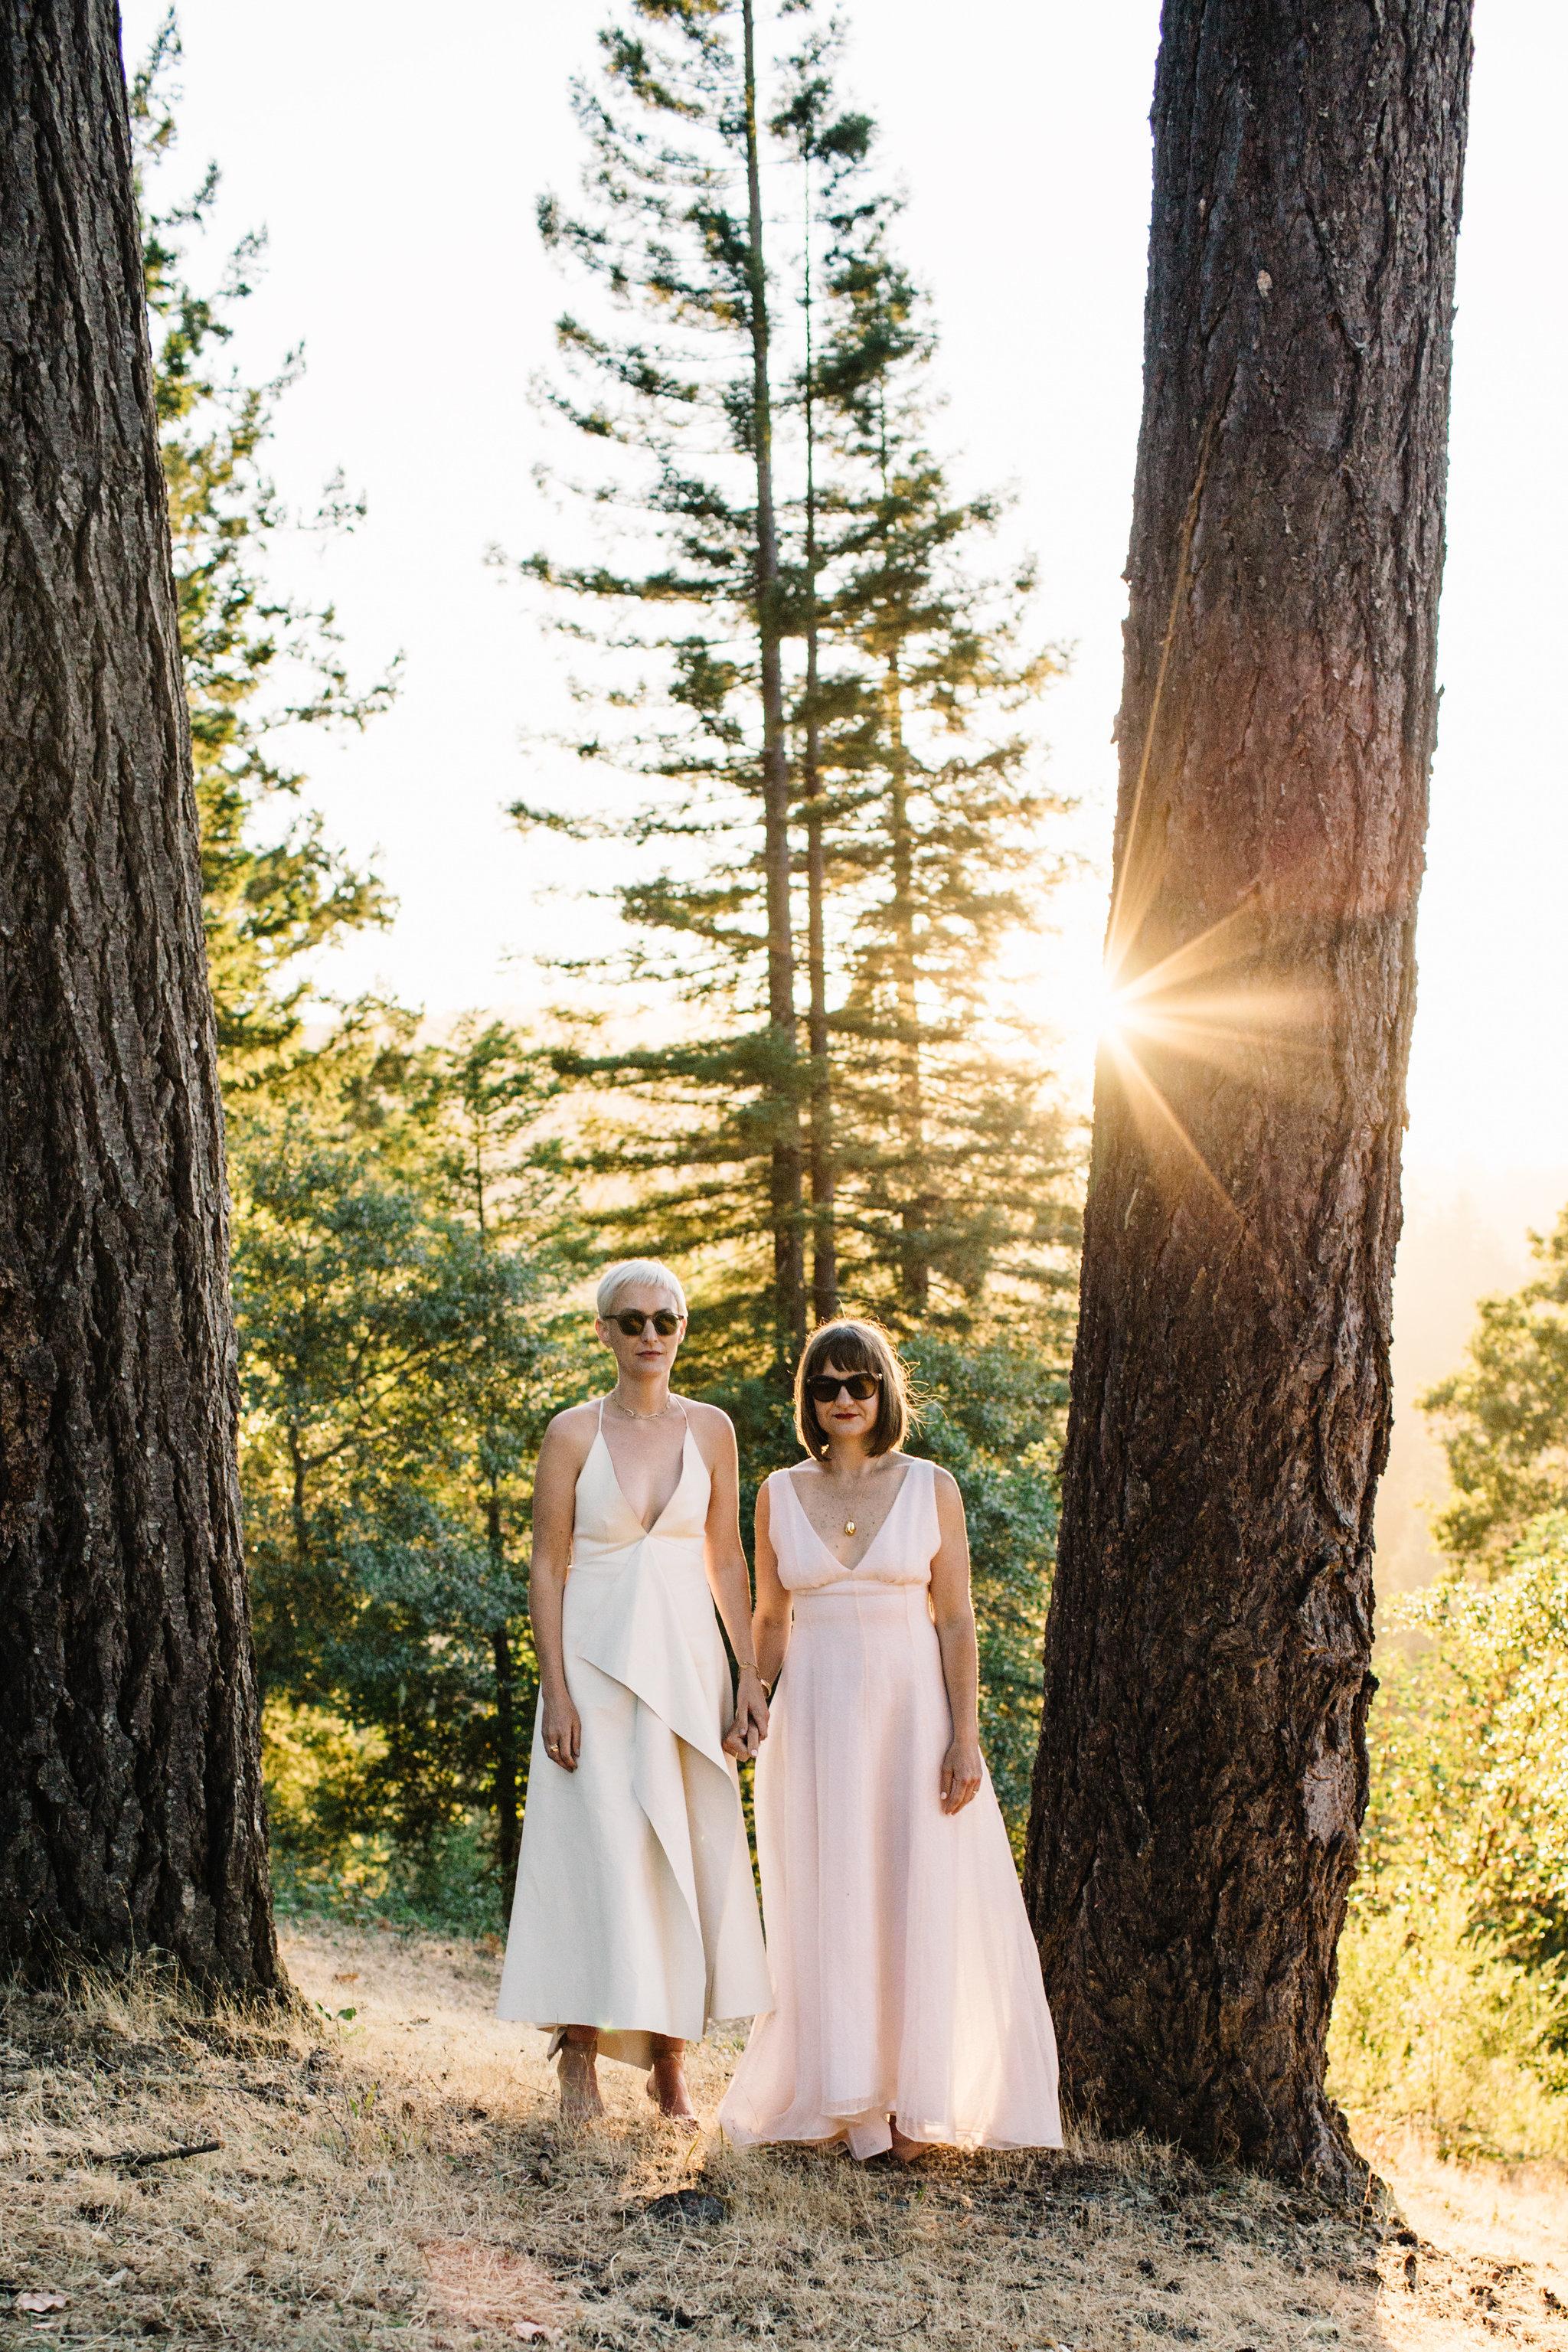 20170708_Brook+Evans_wedding_highres-497.jpg